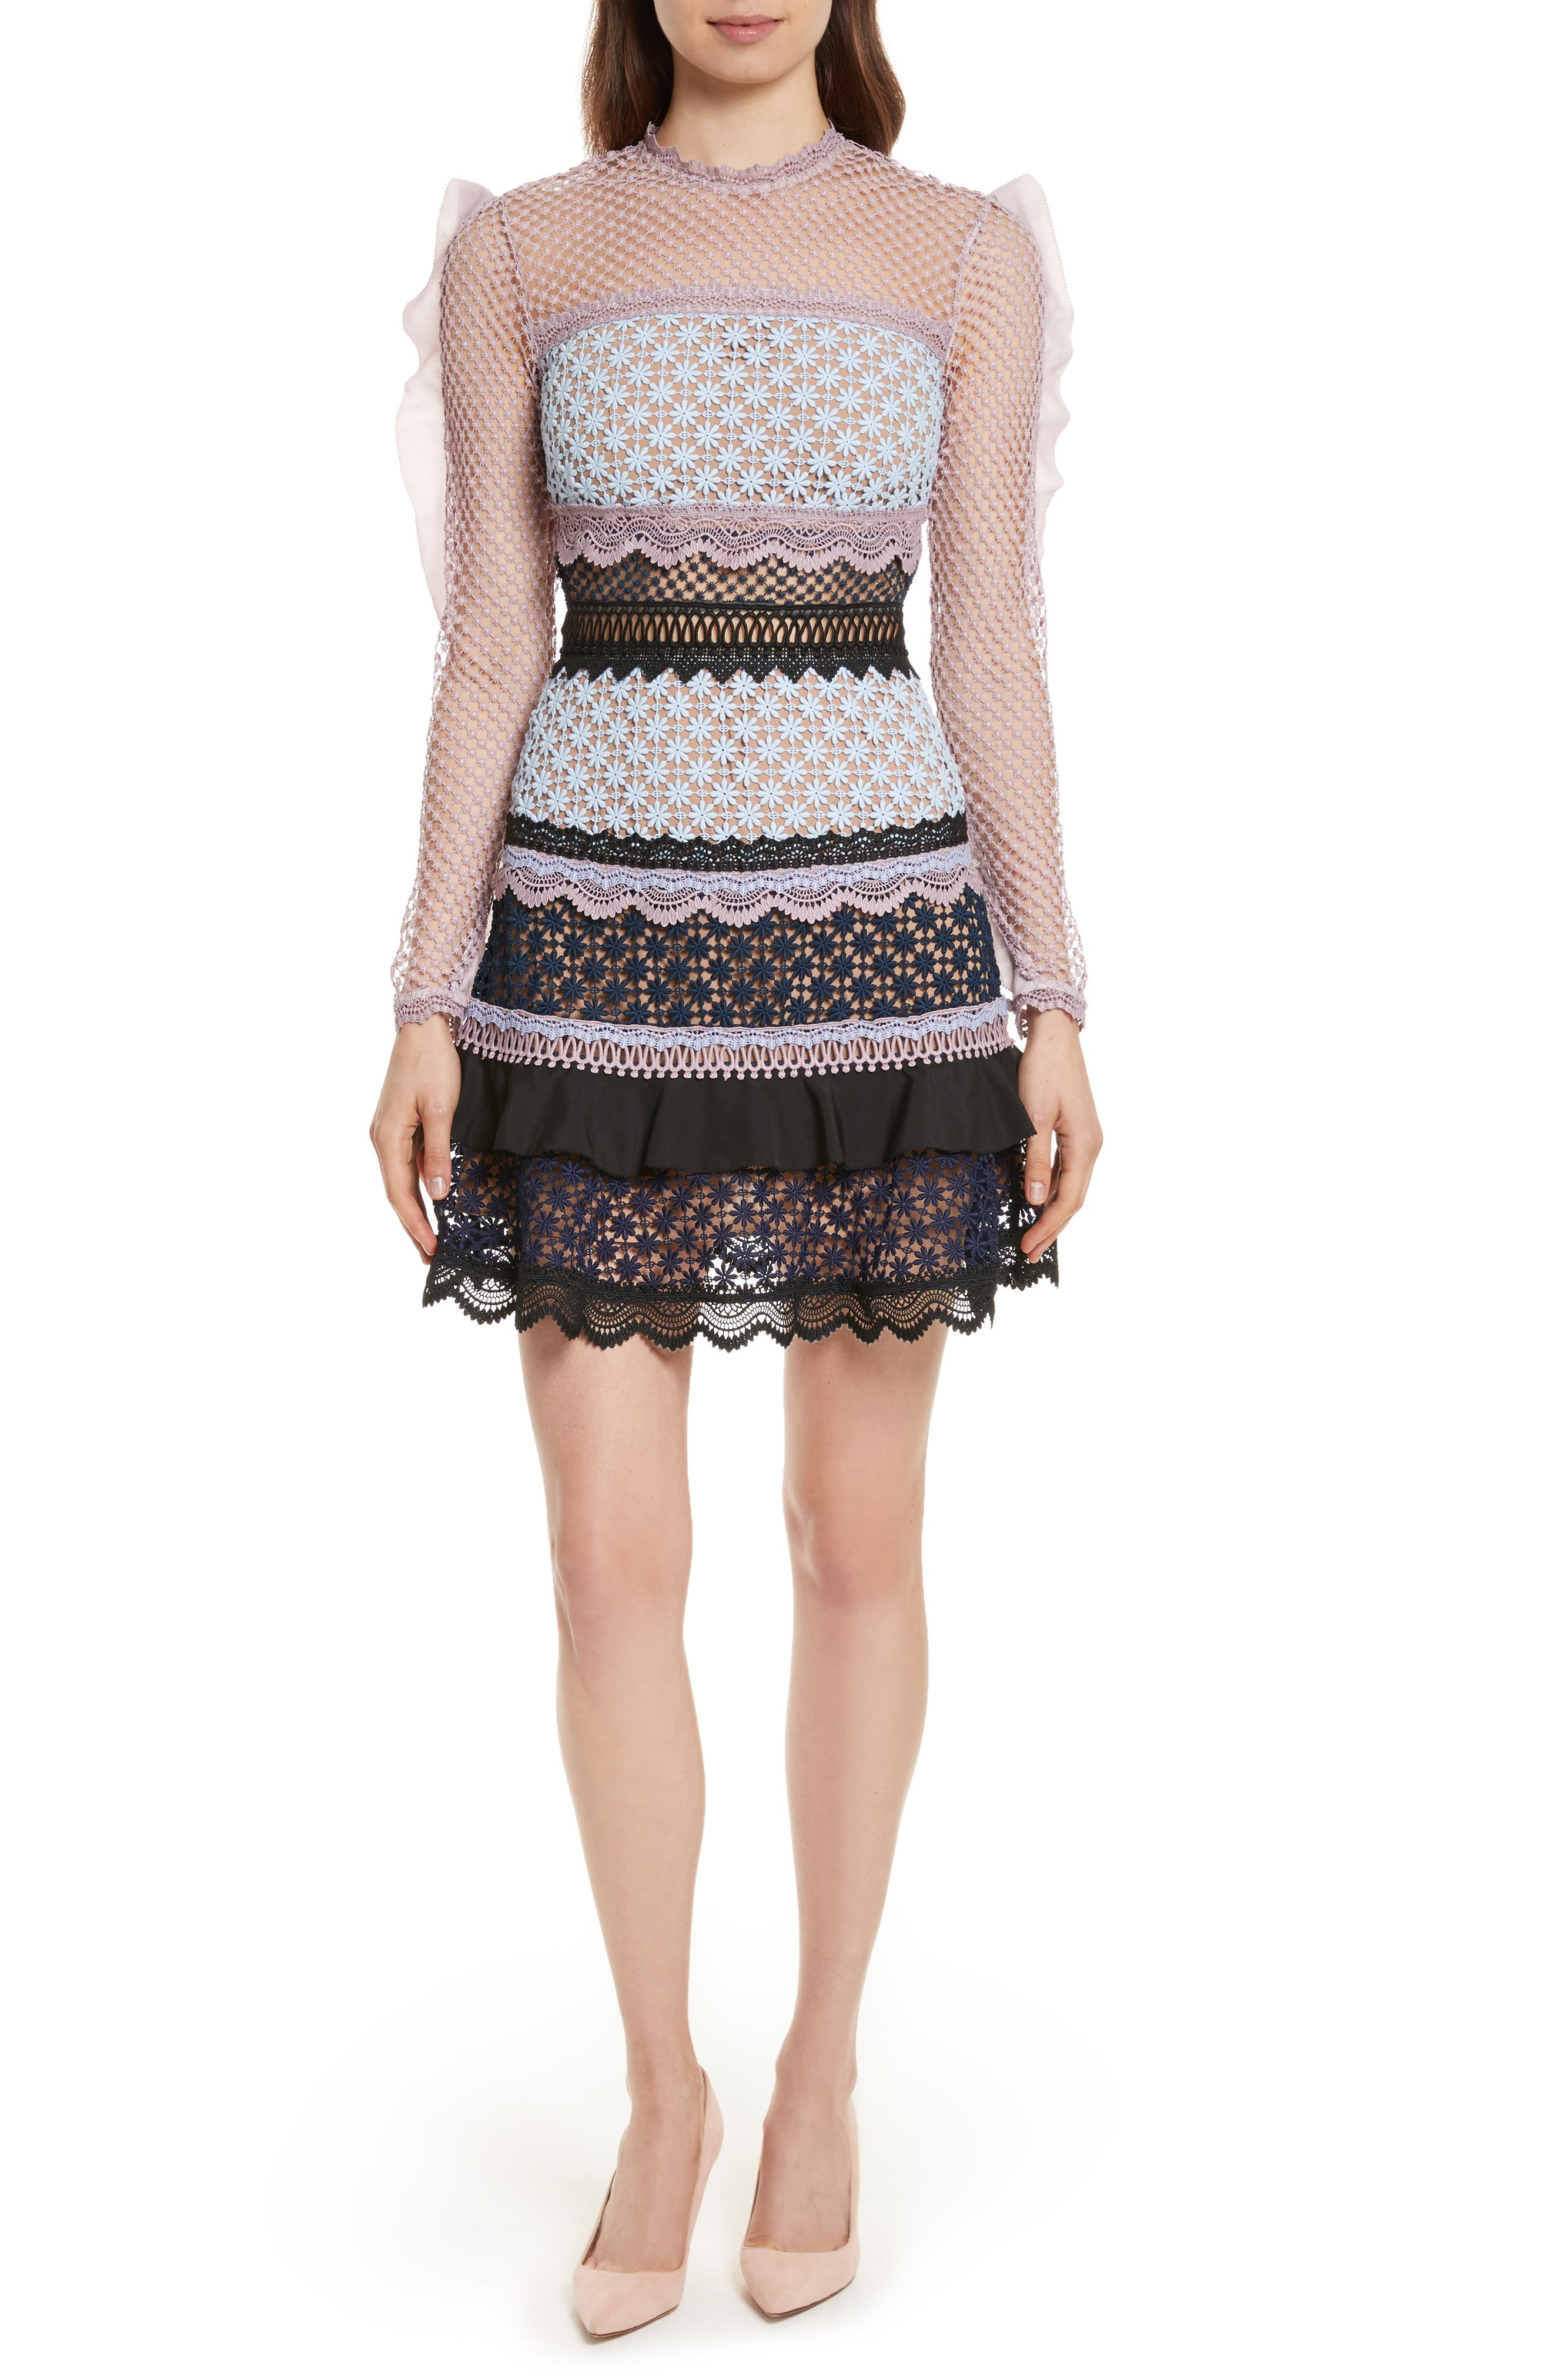 Alternate Image 1 Selected - Self-Portrait Bellis Frill Lace Dress